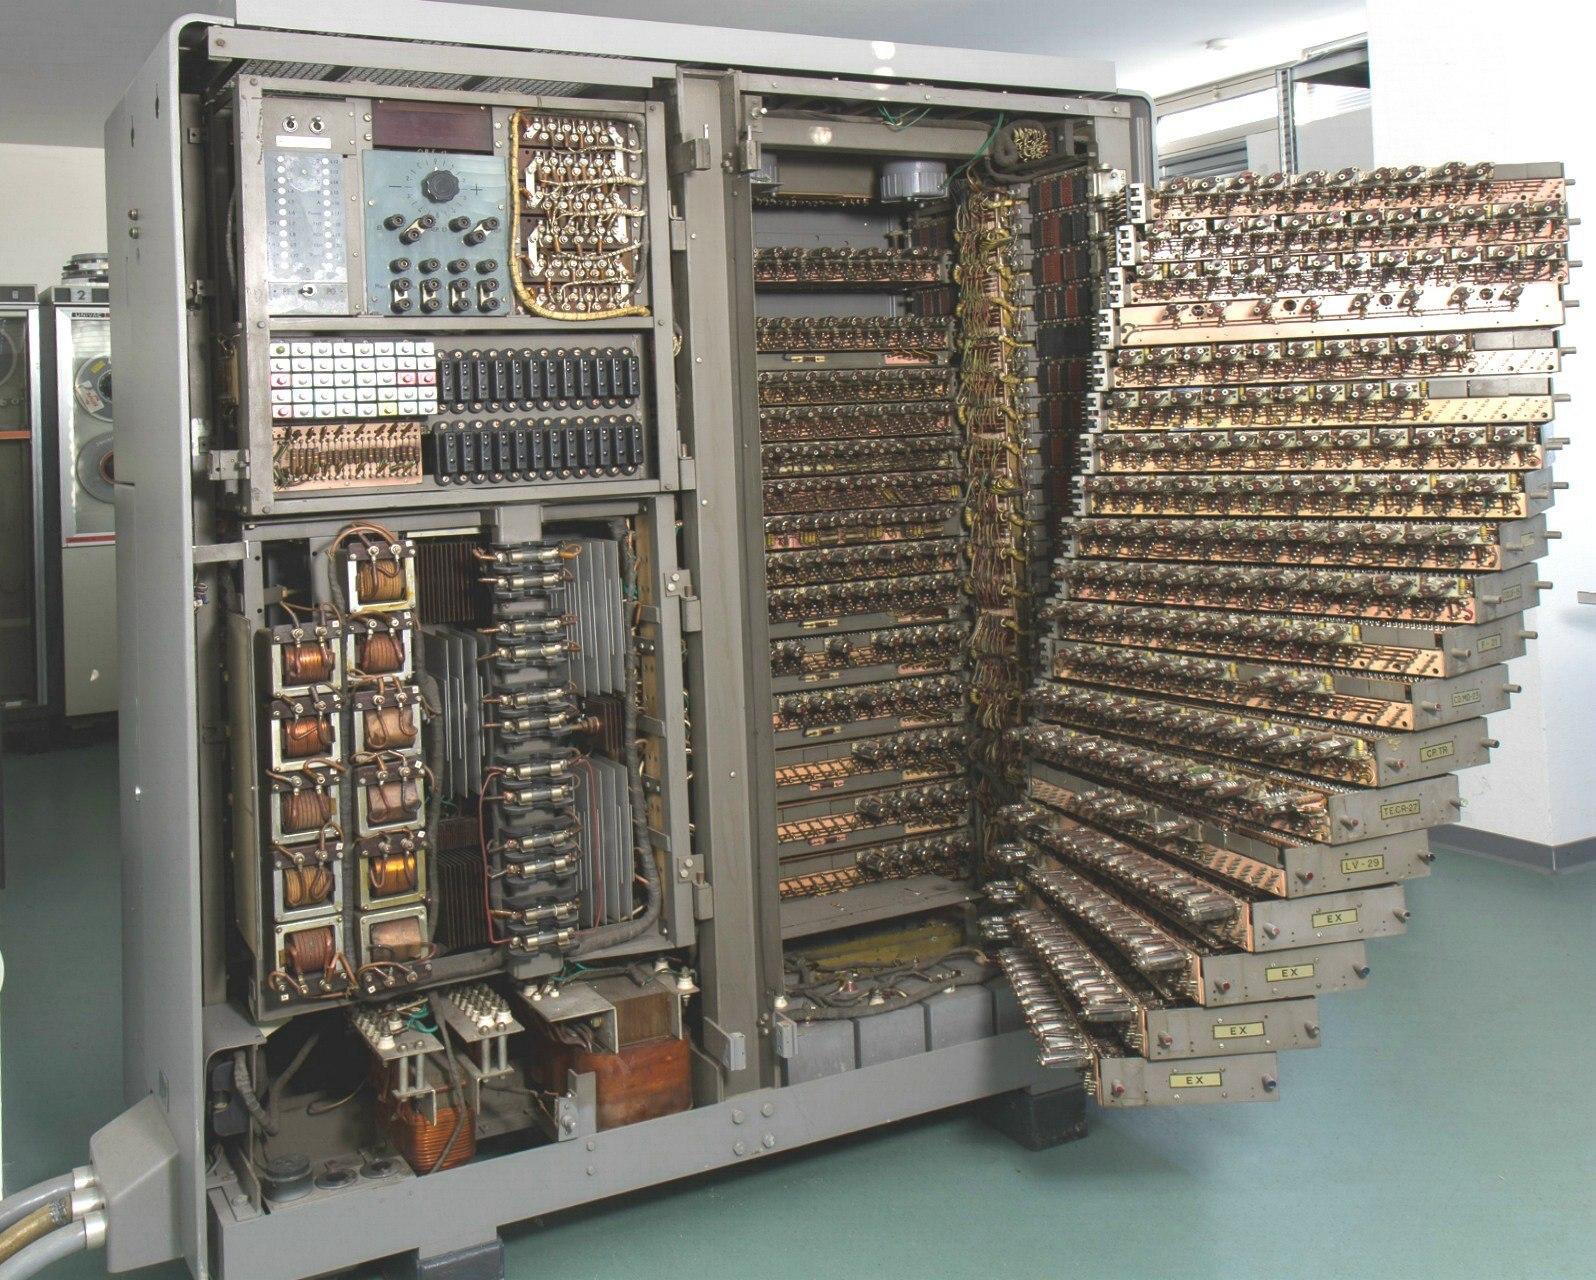 Когда компьютеры были большими